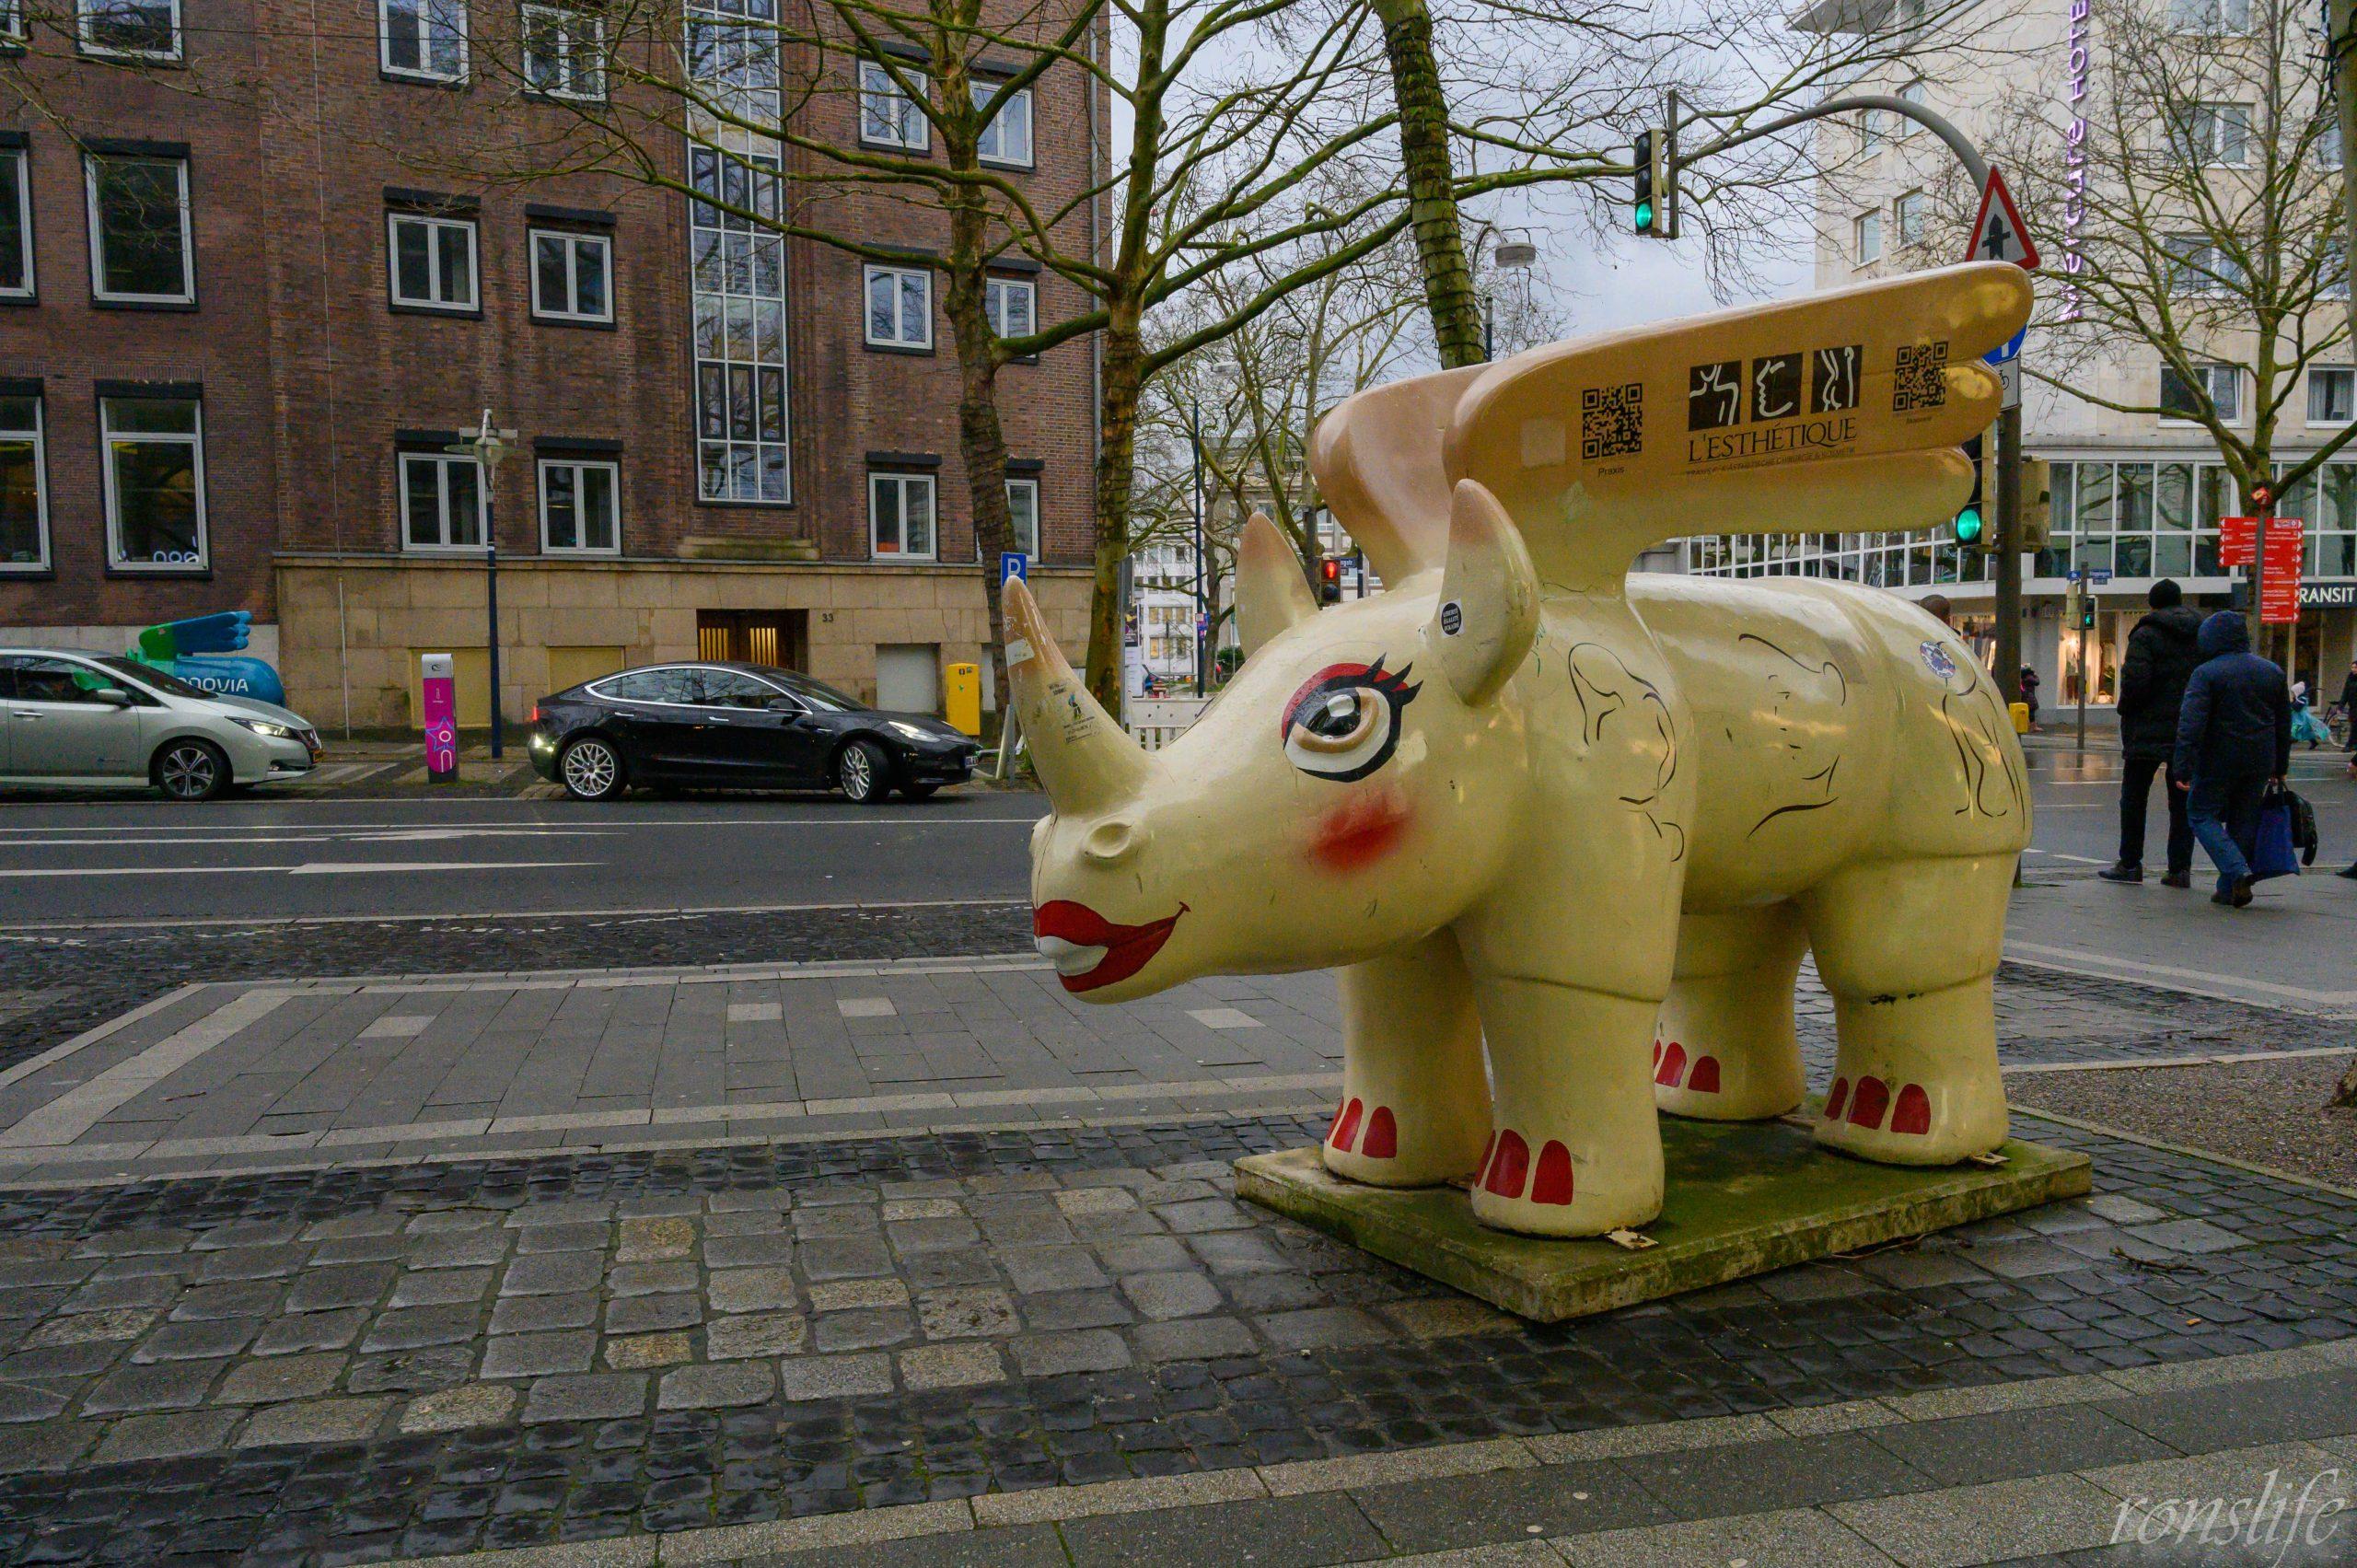 Witte neushoorn op de Kleppingstraße in Dortmund